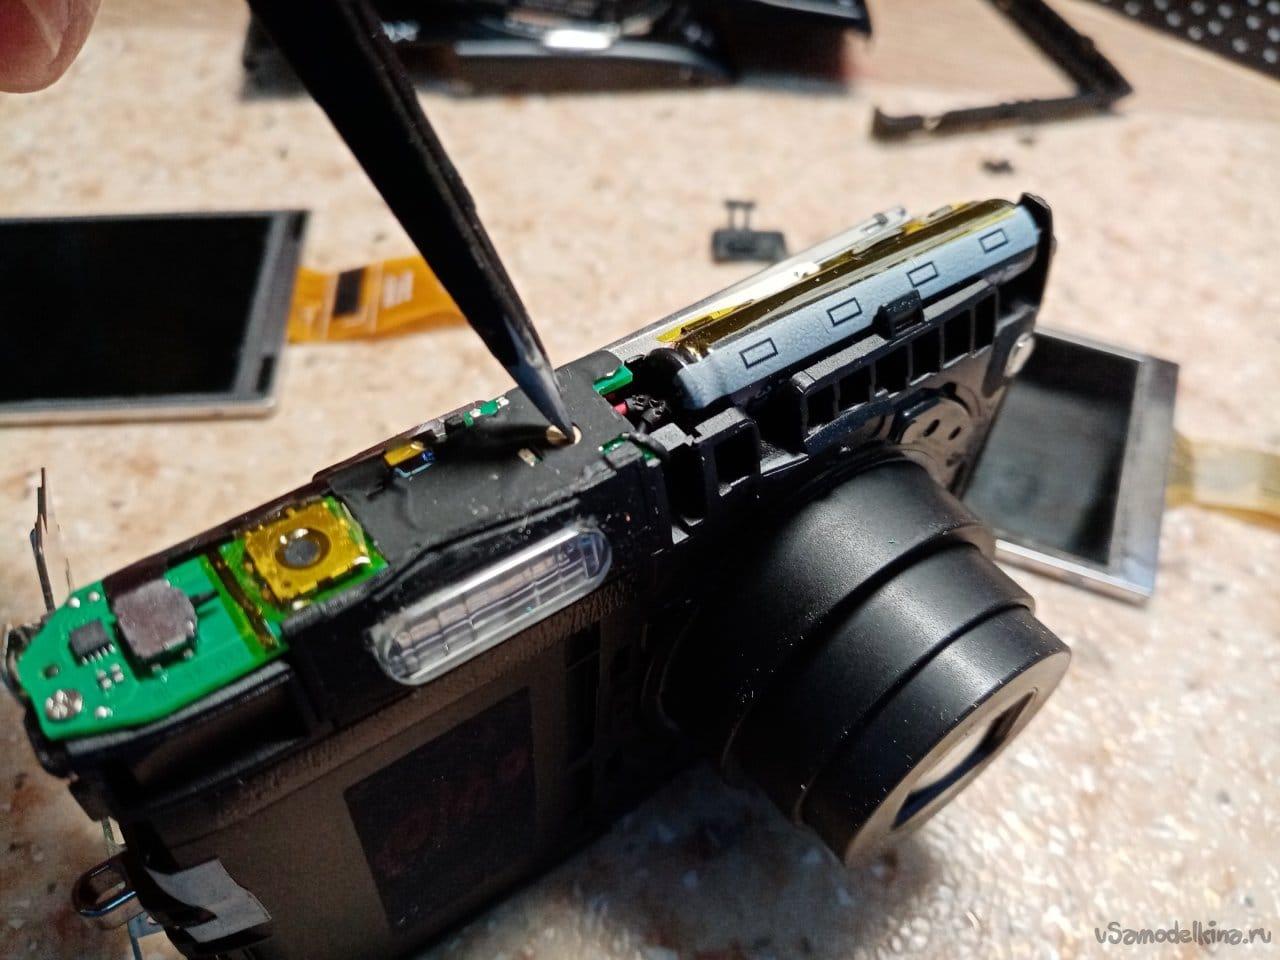 Display replacement. Nikon Coolpix 3500